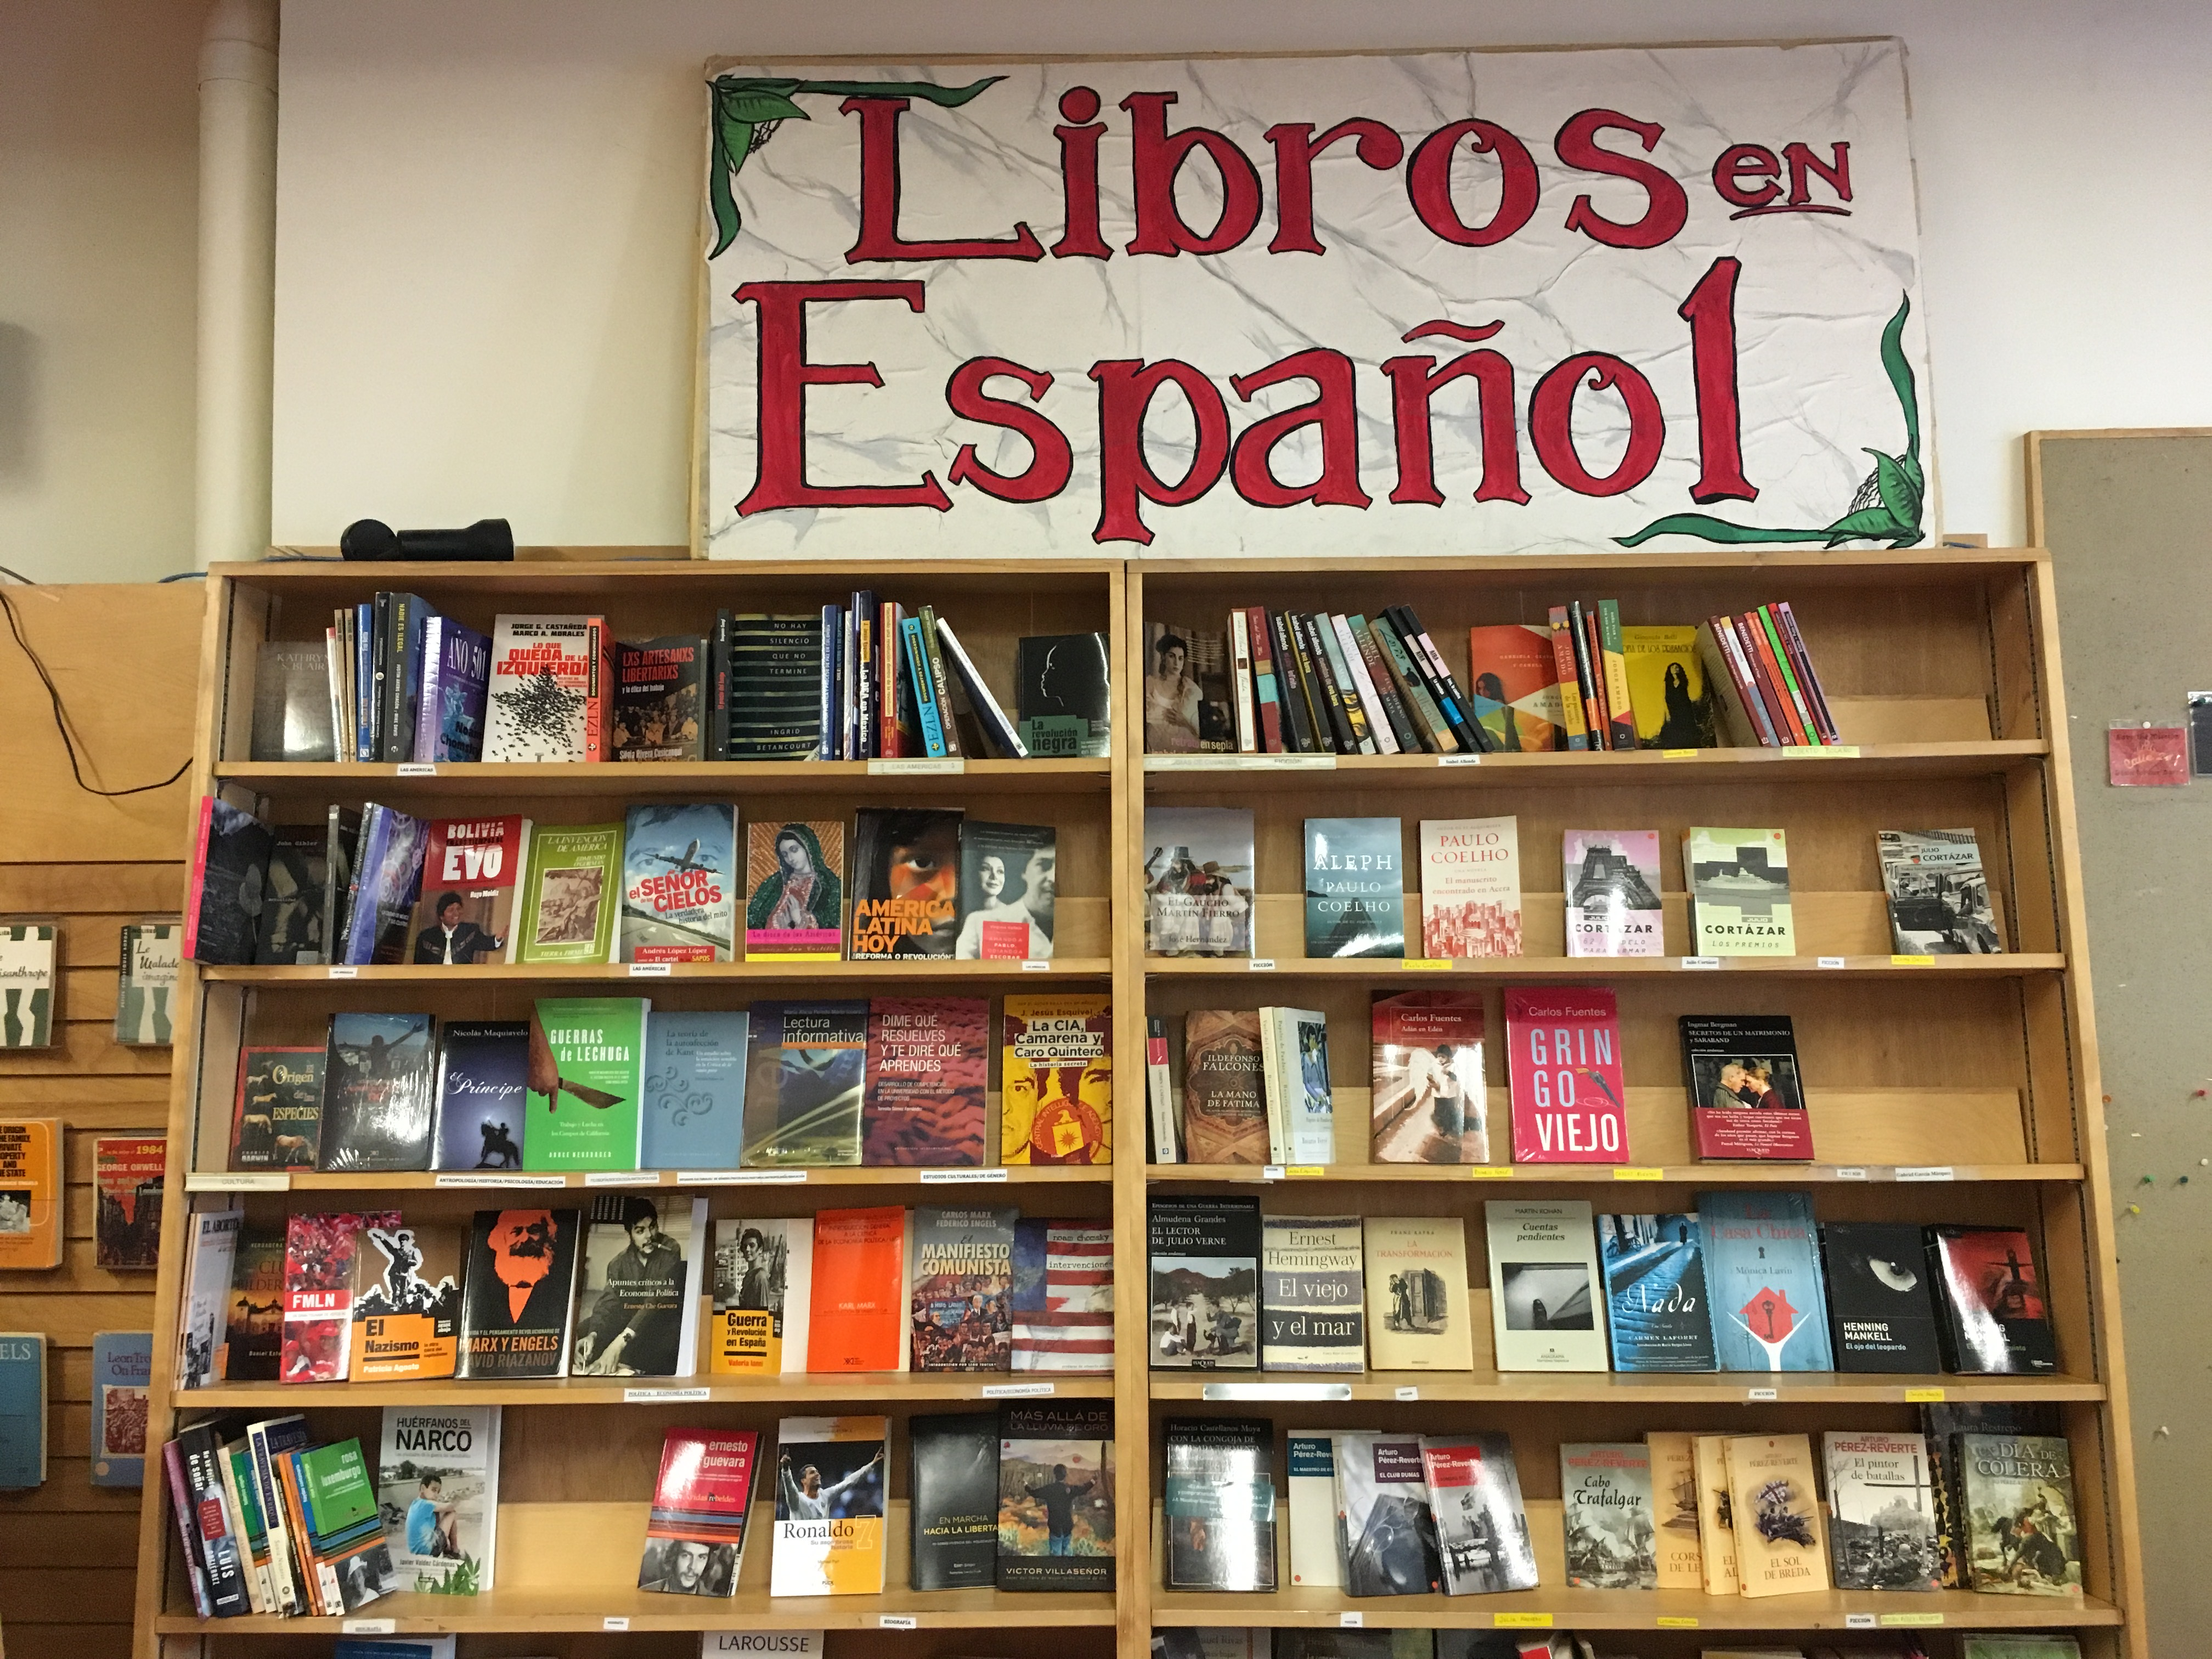 Modern Times Bookstore on its penultimate day, November 14, 2016. Photo by Joe Rivano Barros.